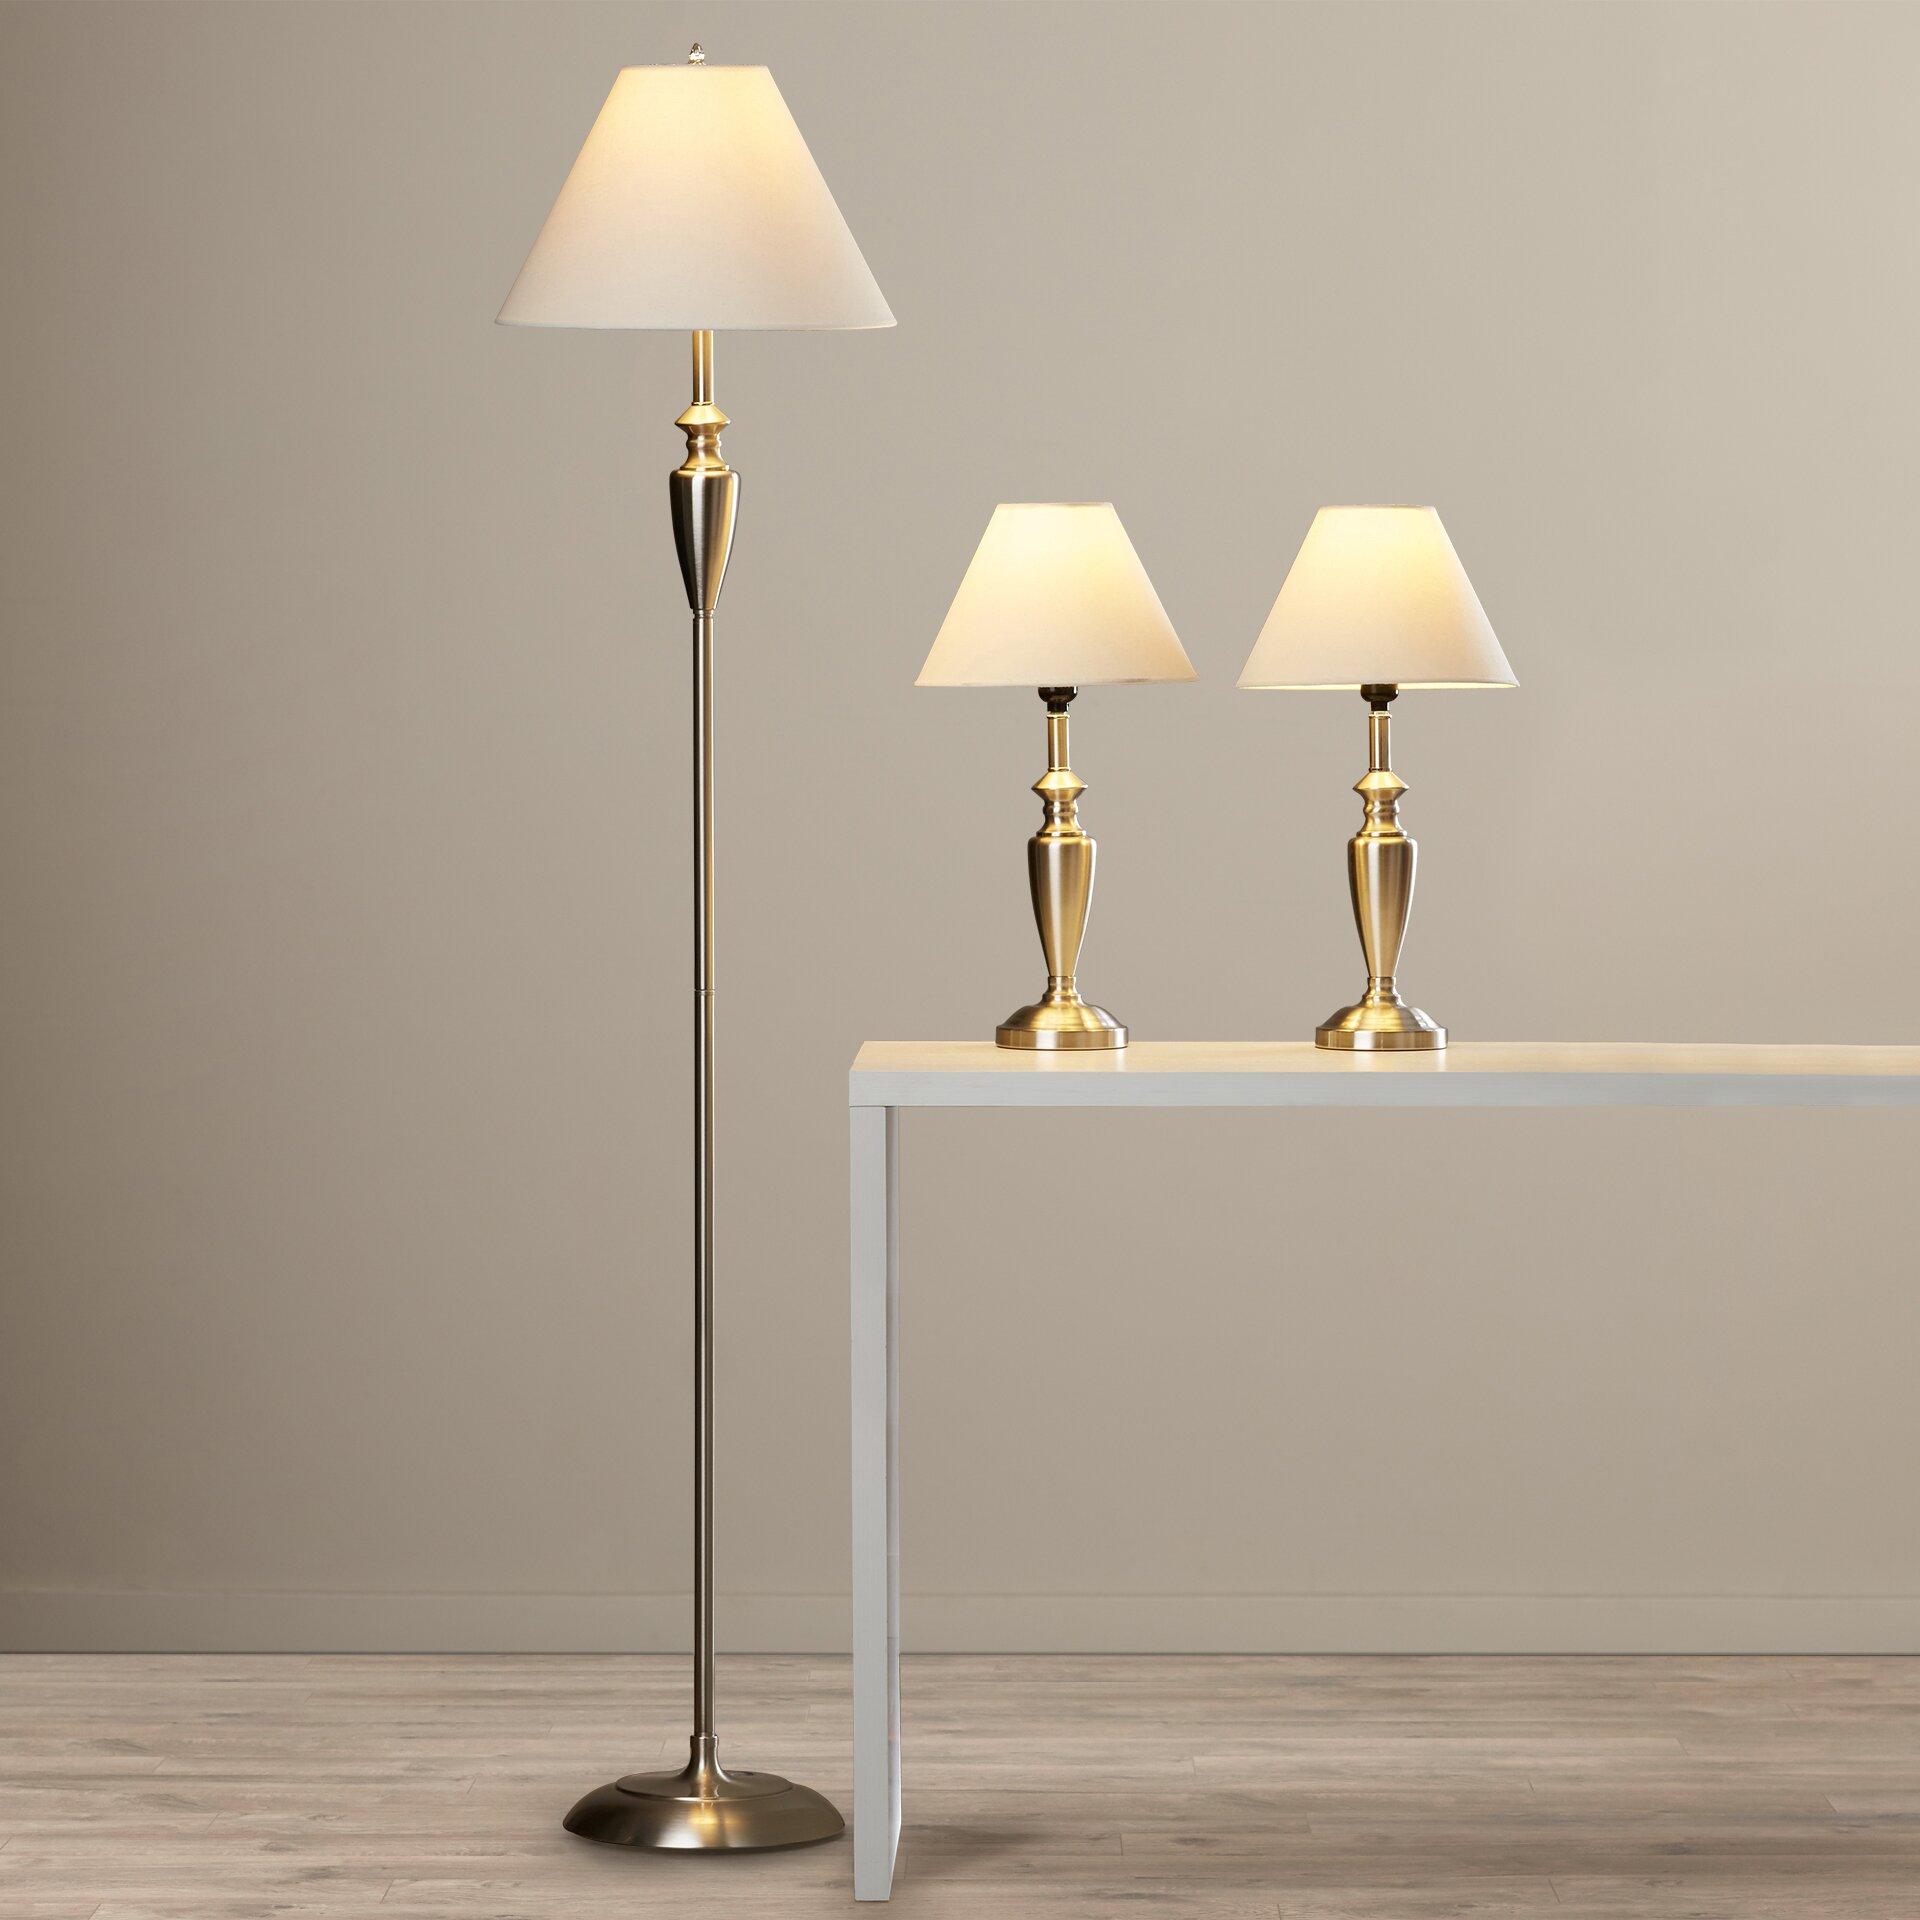 beachcrest home castine 3 piece 63 5 39 39 table lamp set. Black Bedroom Furniture Sets. Home Design Ideas